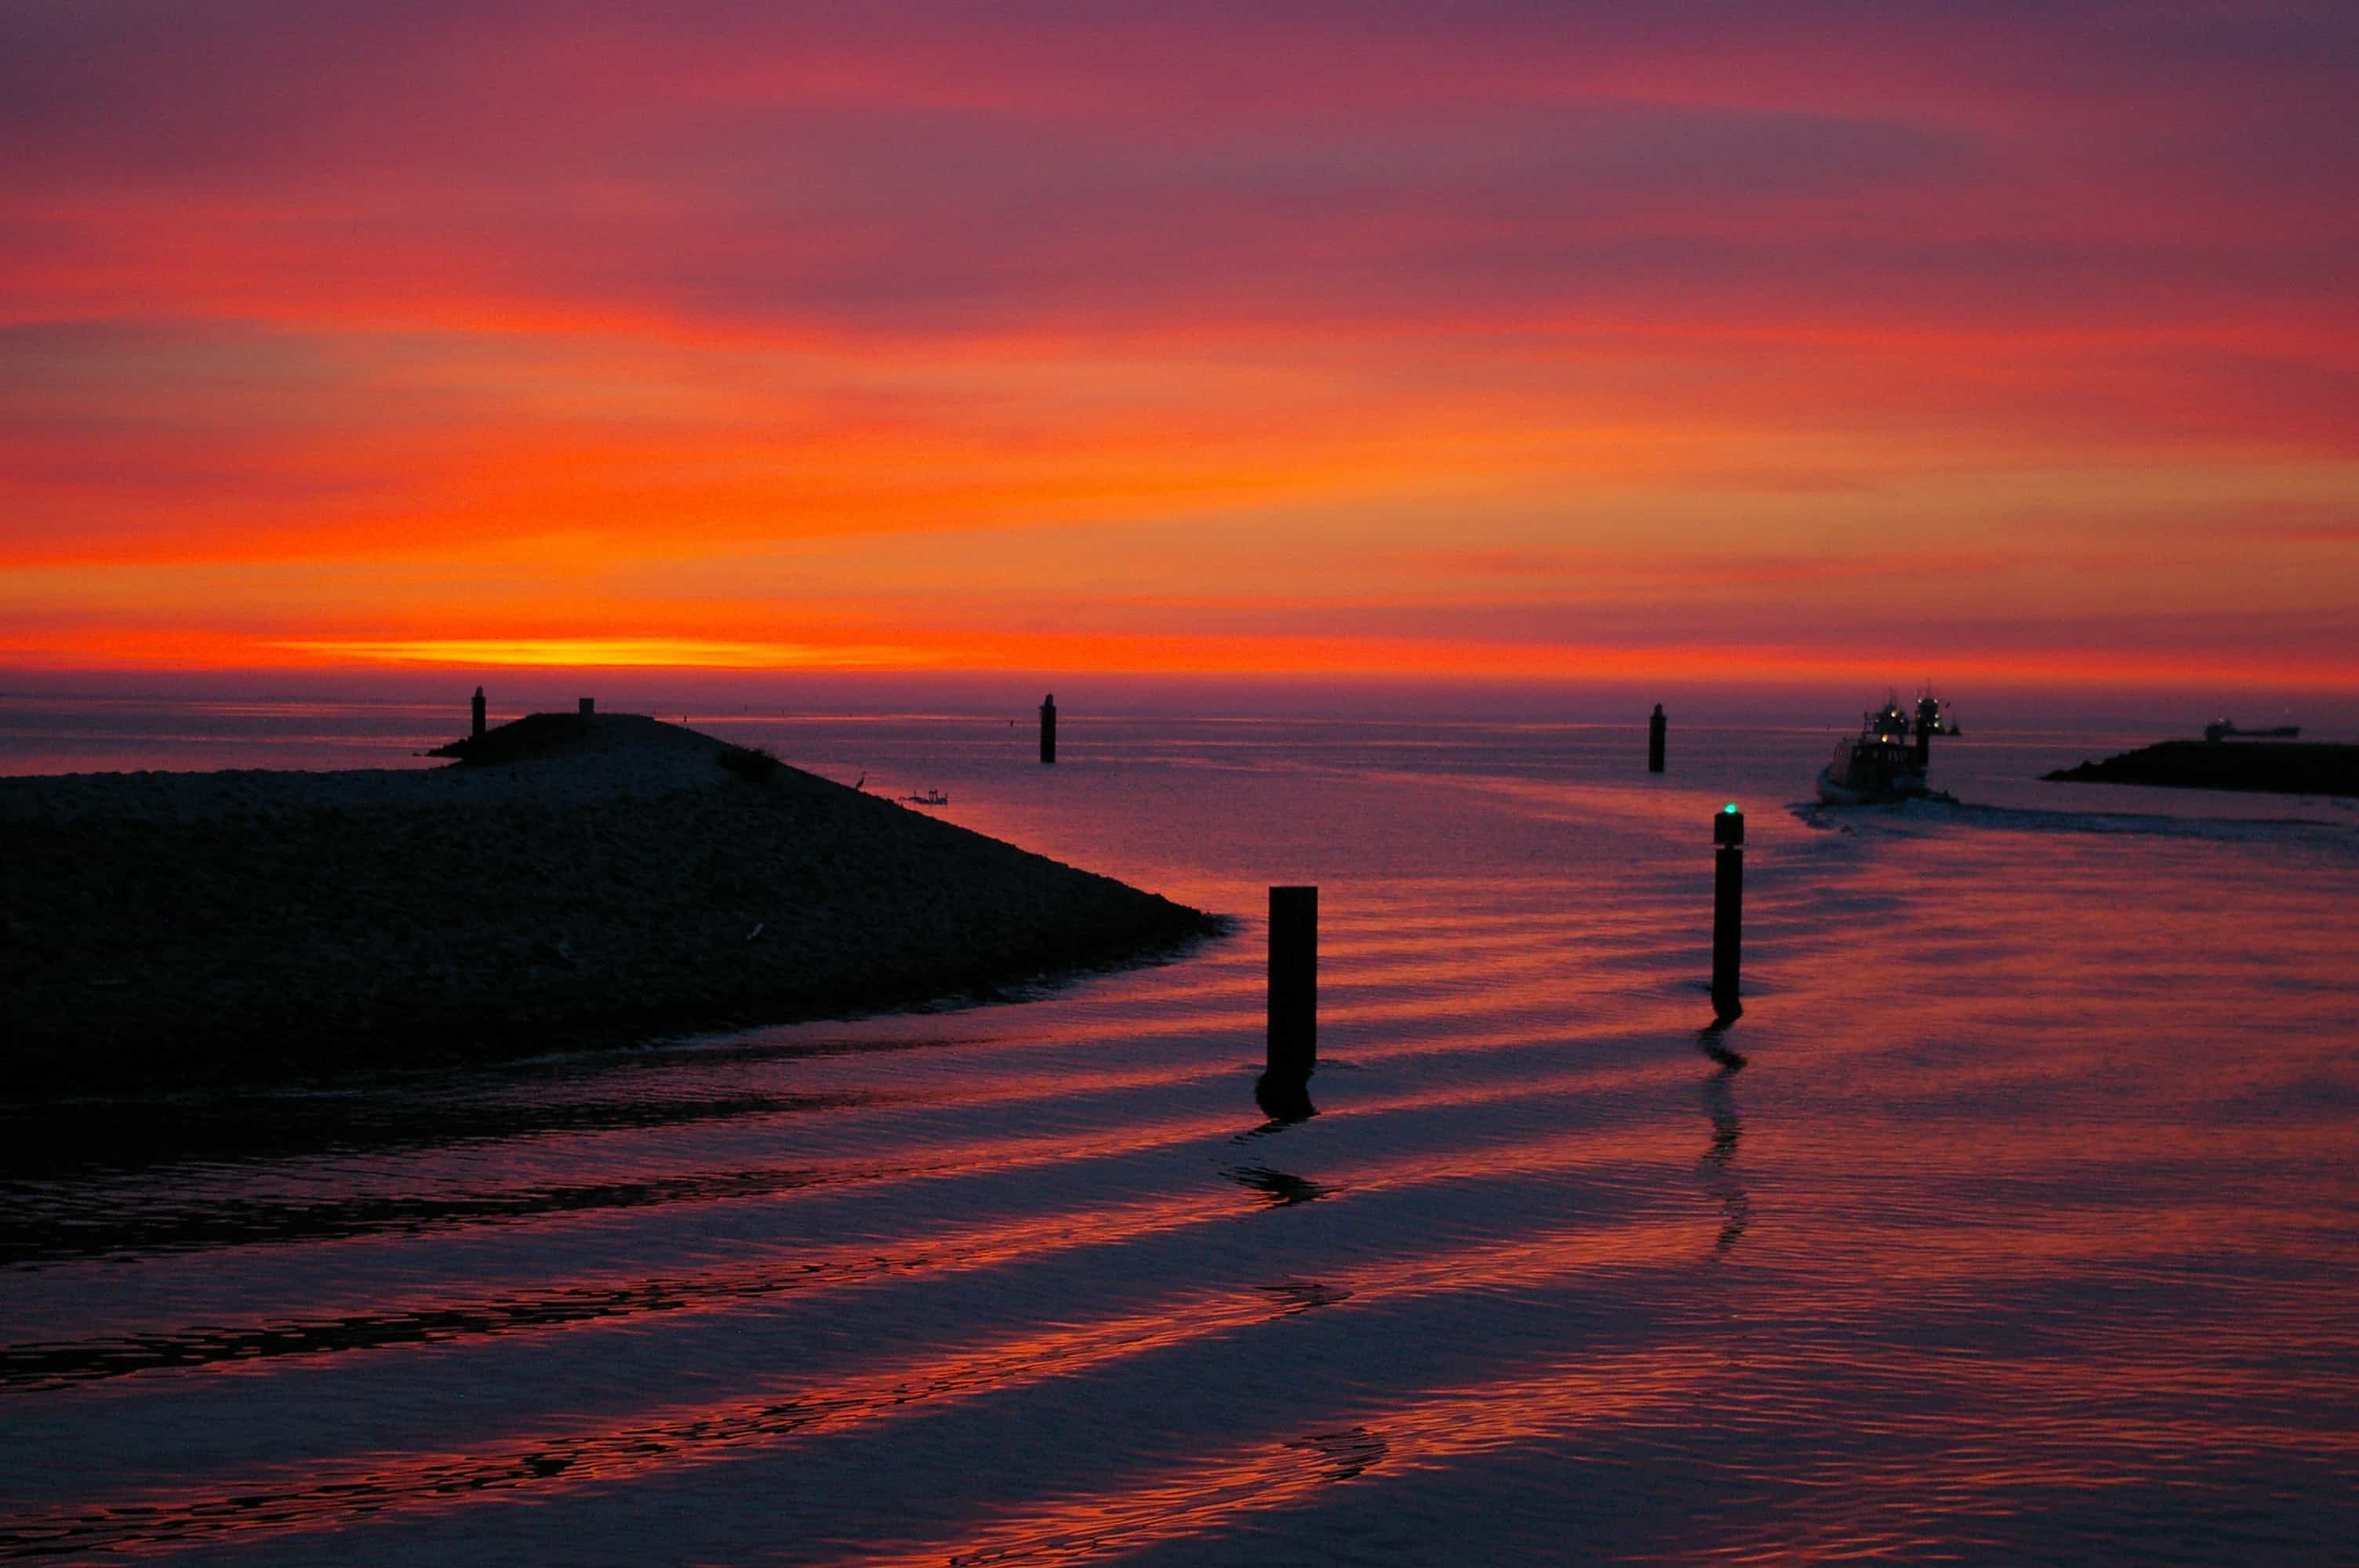 Golf Wallpaper Hd Free Picture Sunrise Pacific Dawn Water Beach Sea